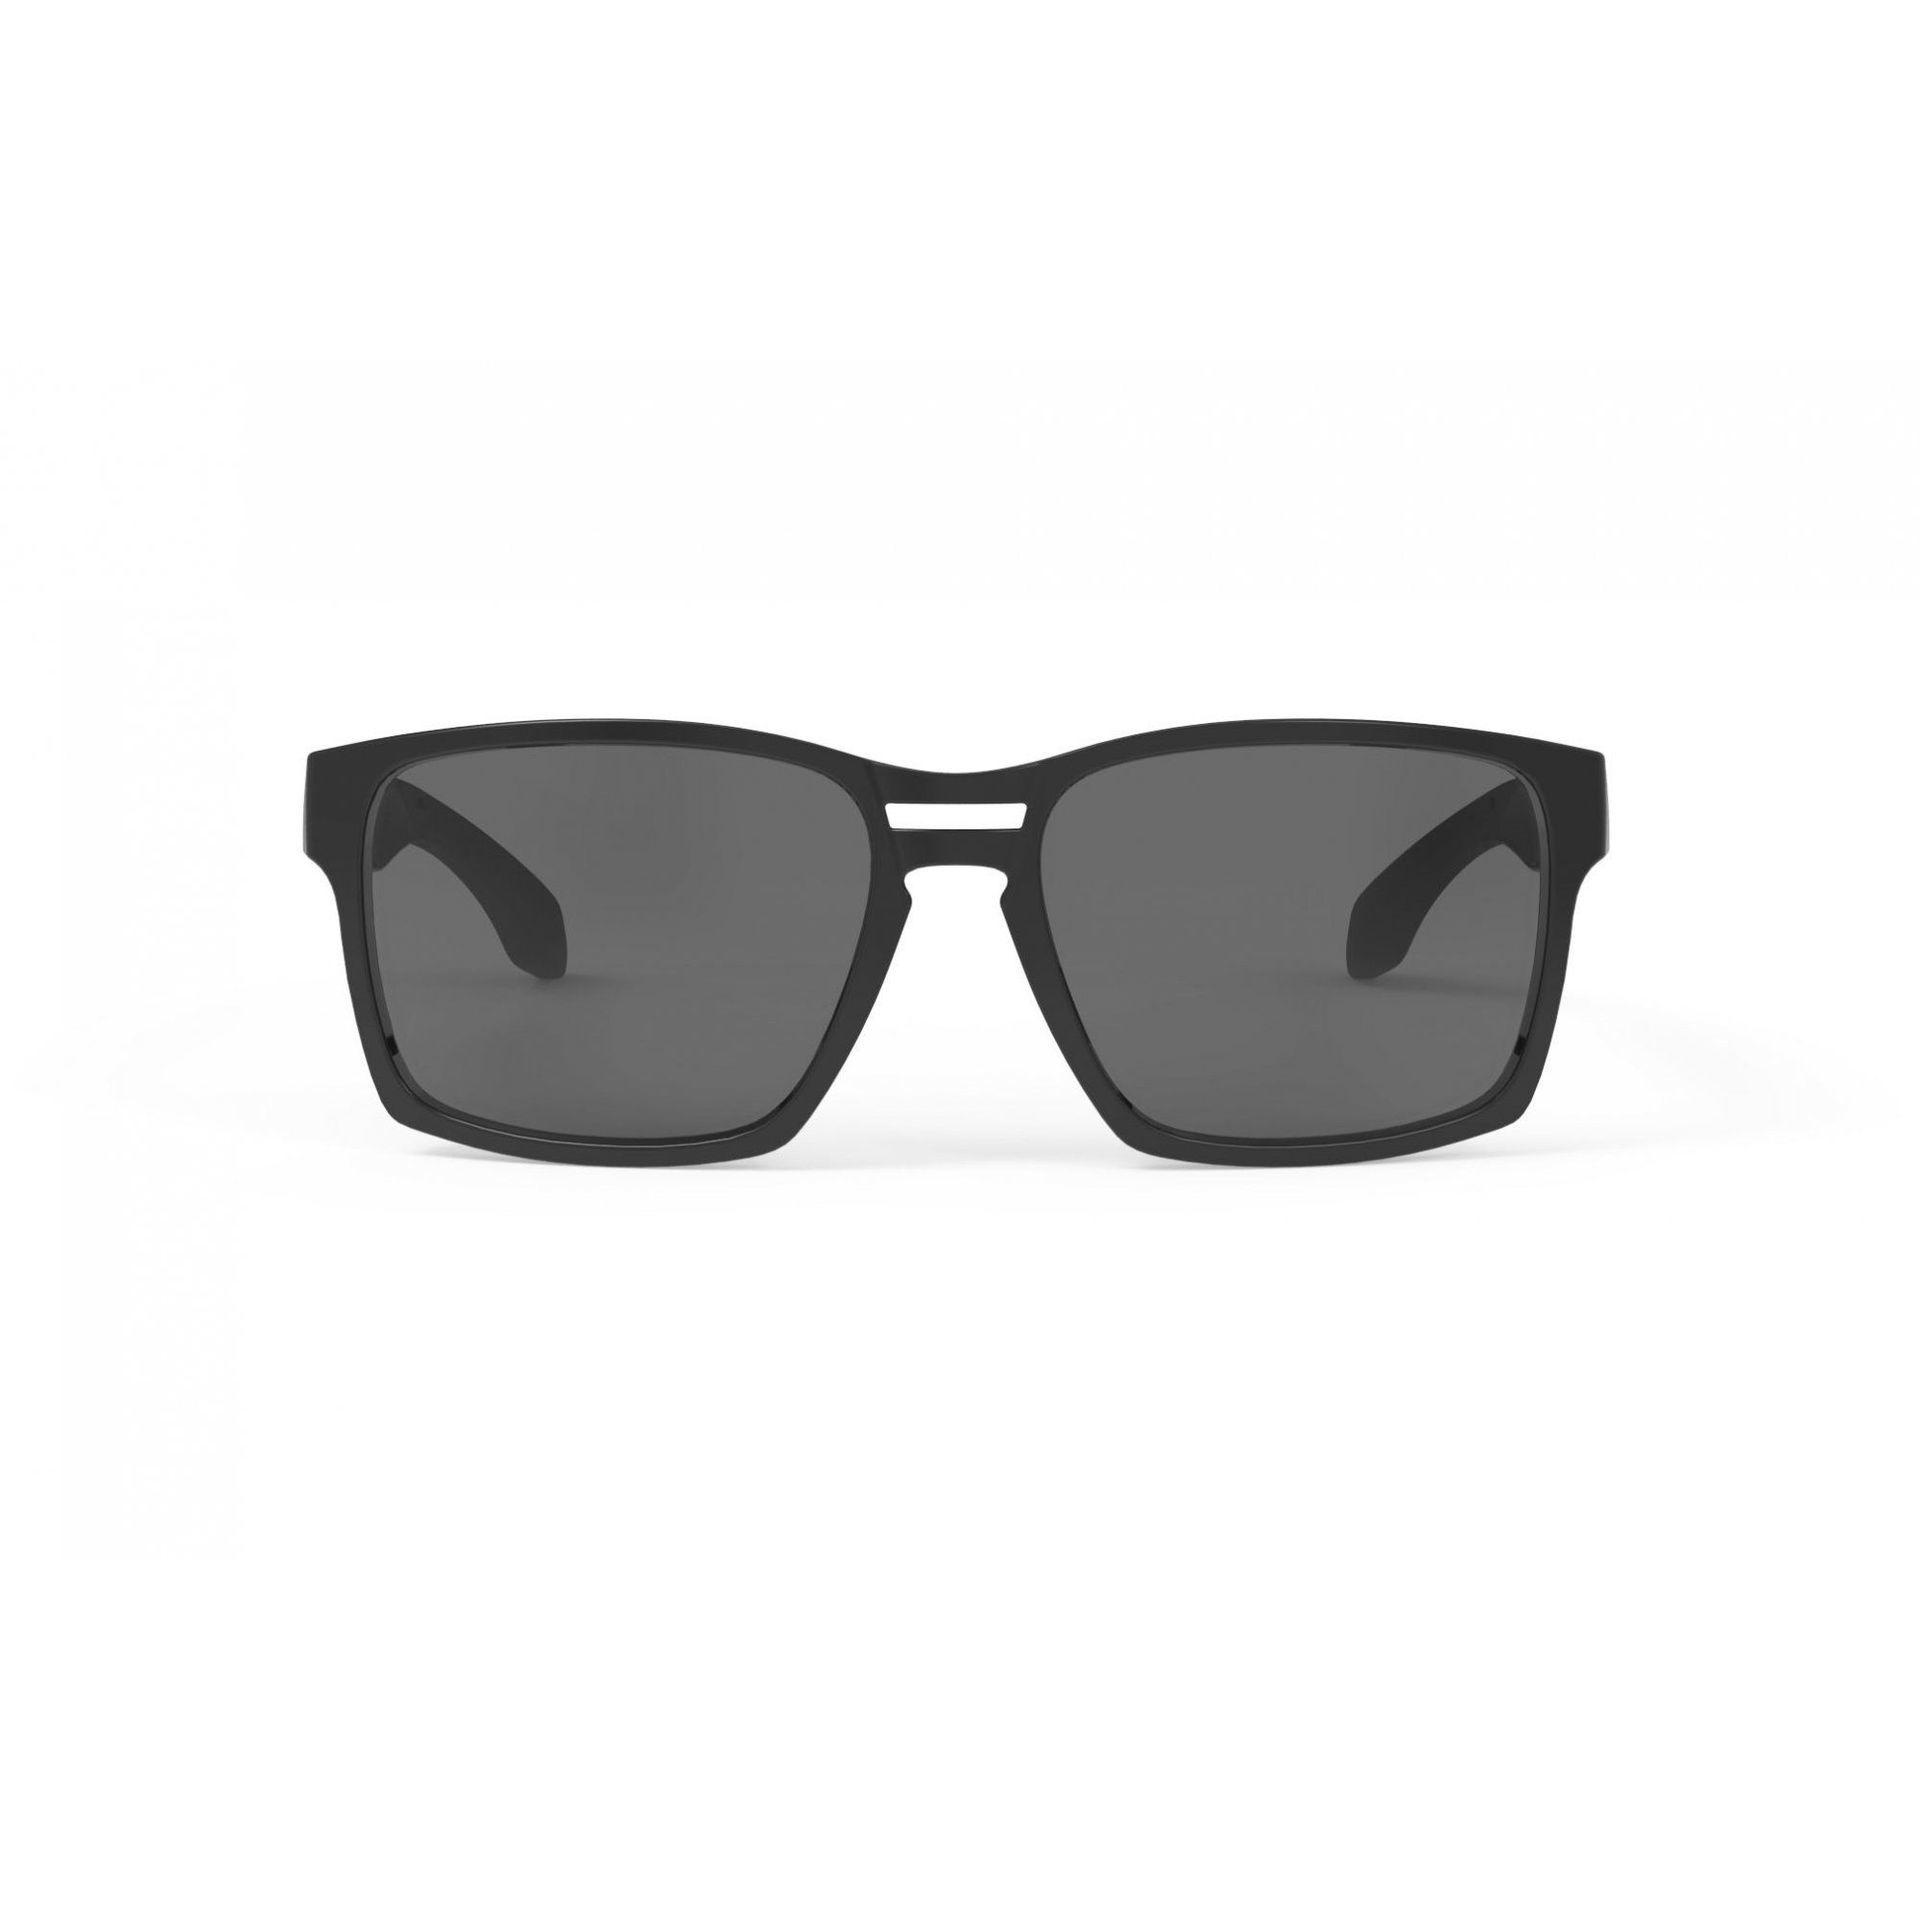 OKULARY RUDY PROJECT SPINAIR 57 BLACK + SMOKE BLACK SP571042 2